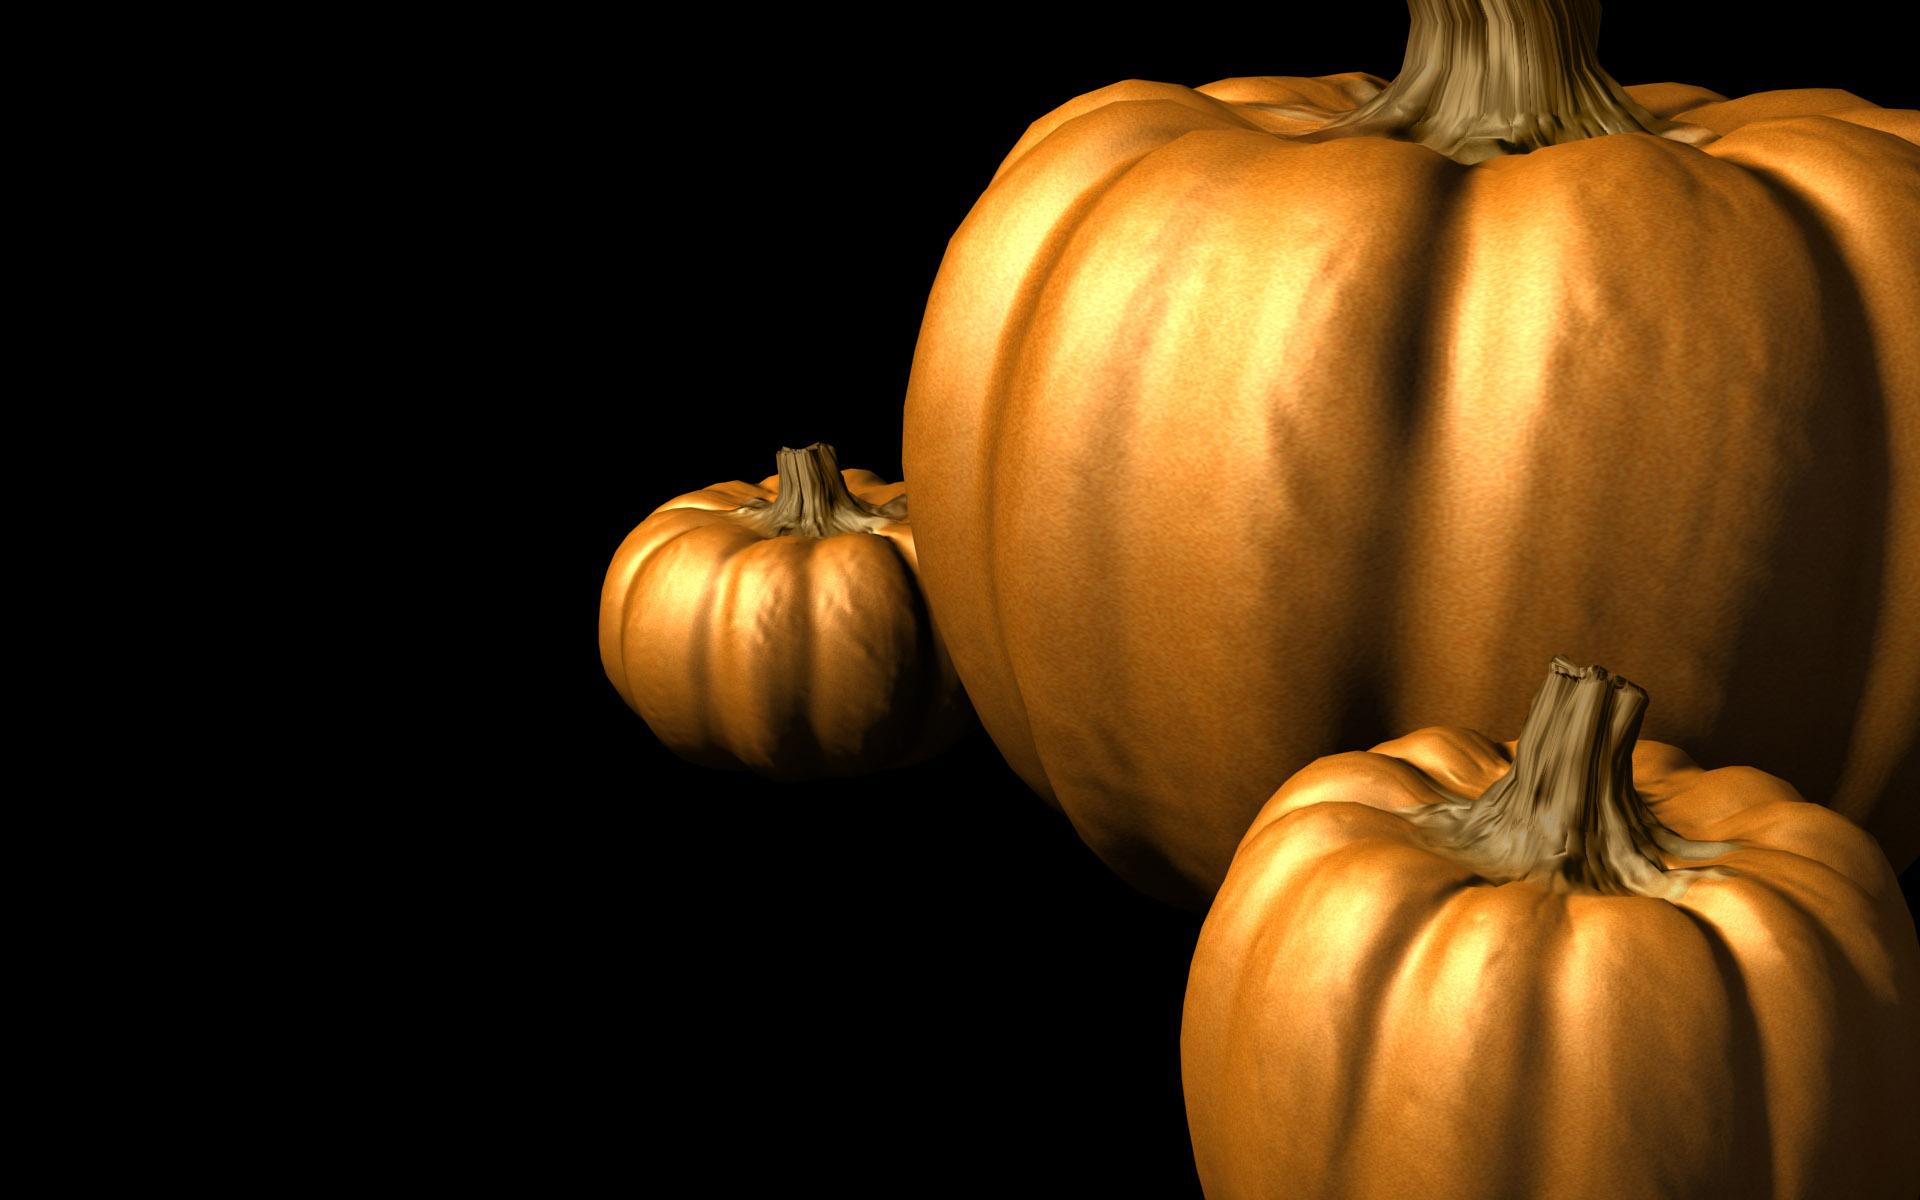 Fall pumpkin wallpaper for desktop wallpapersafari - Fall wallpaper pumpkins ...